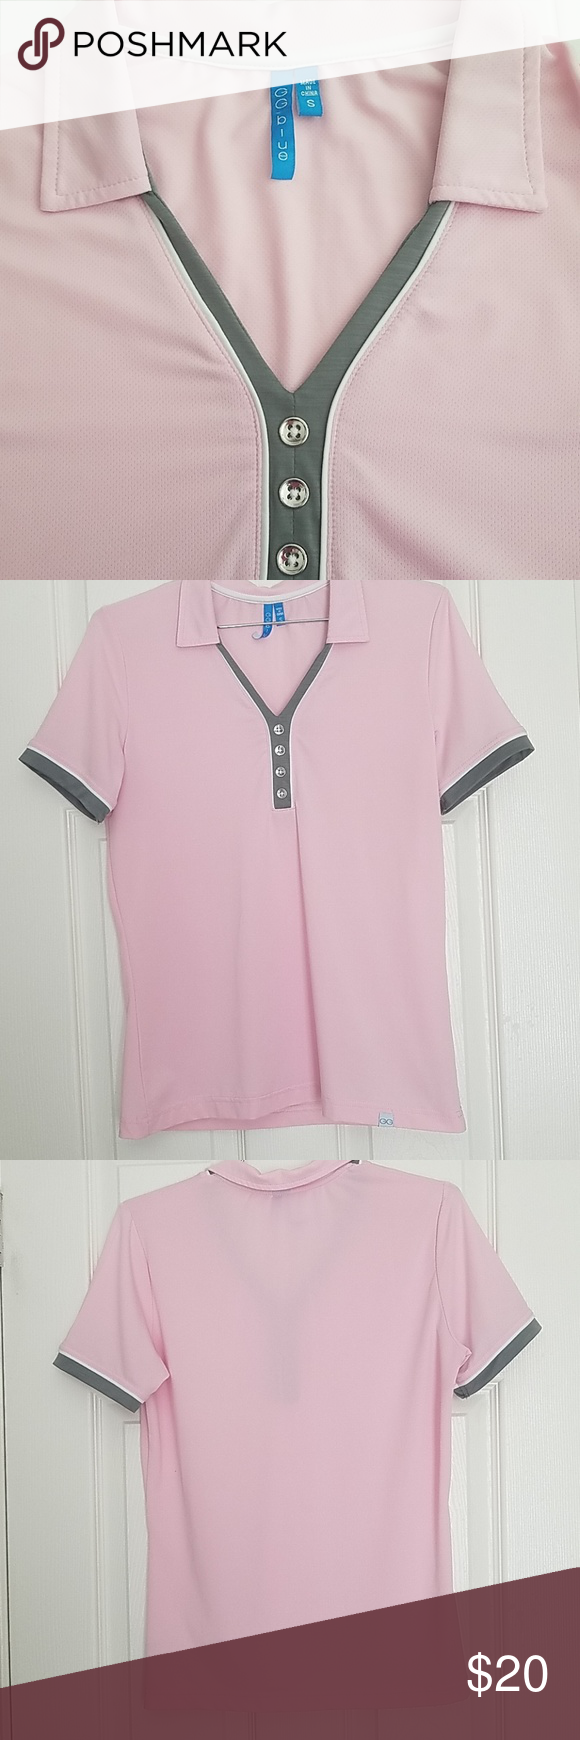 Gg Blue Golf Shirt Pink Green Size Small Golf Shirts Clothes Design Fashion